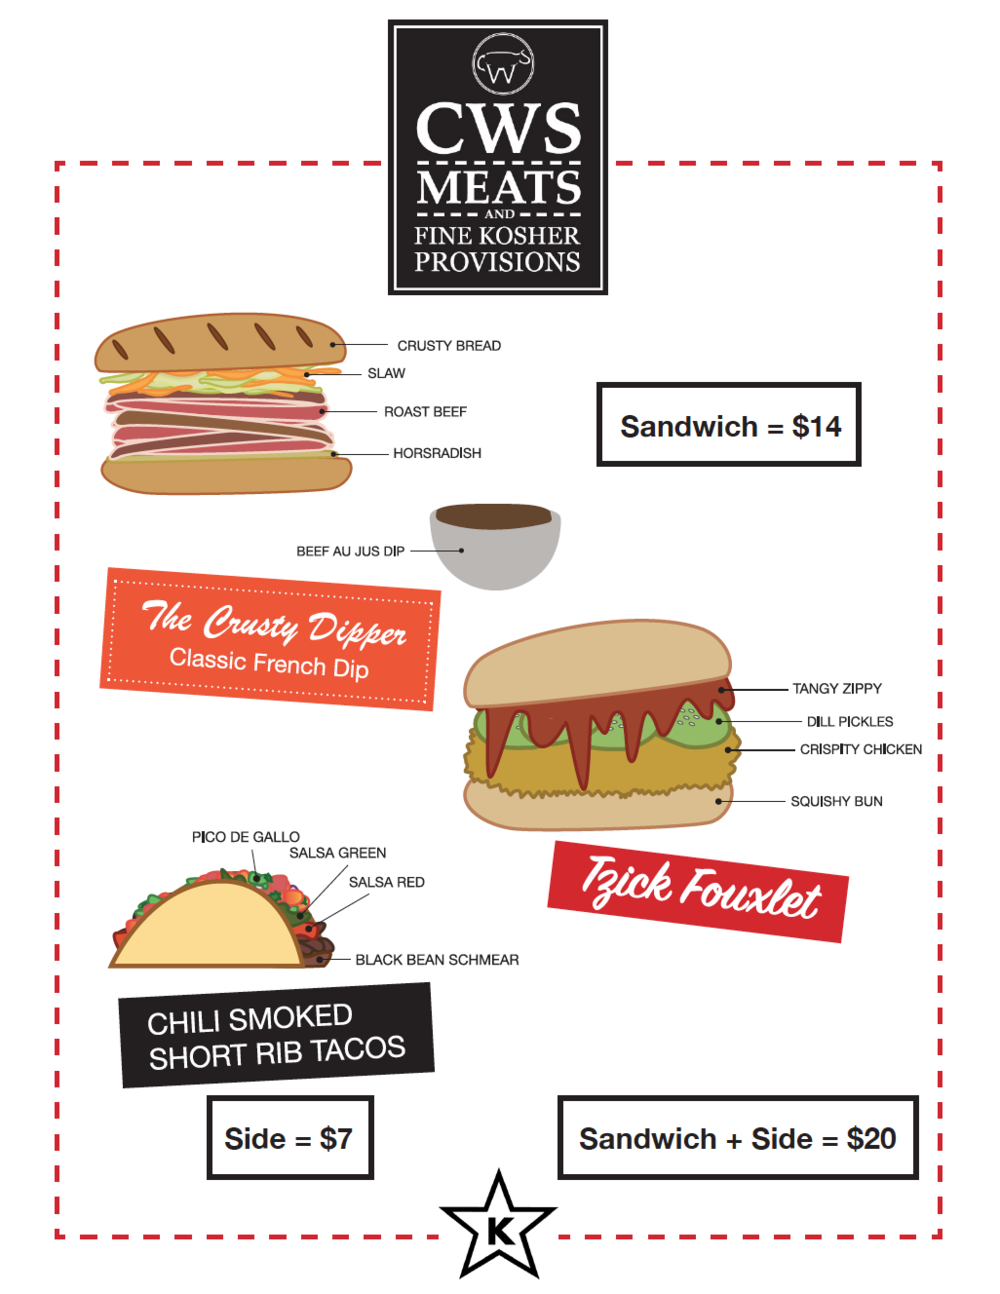 CWS menu 2/21